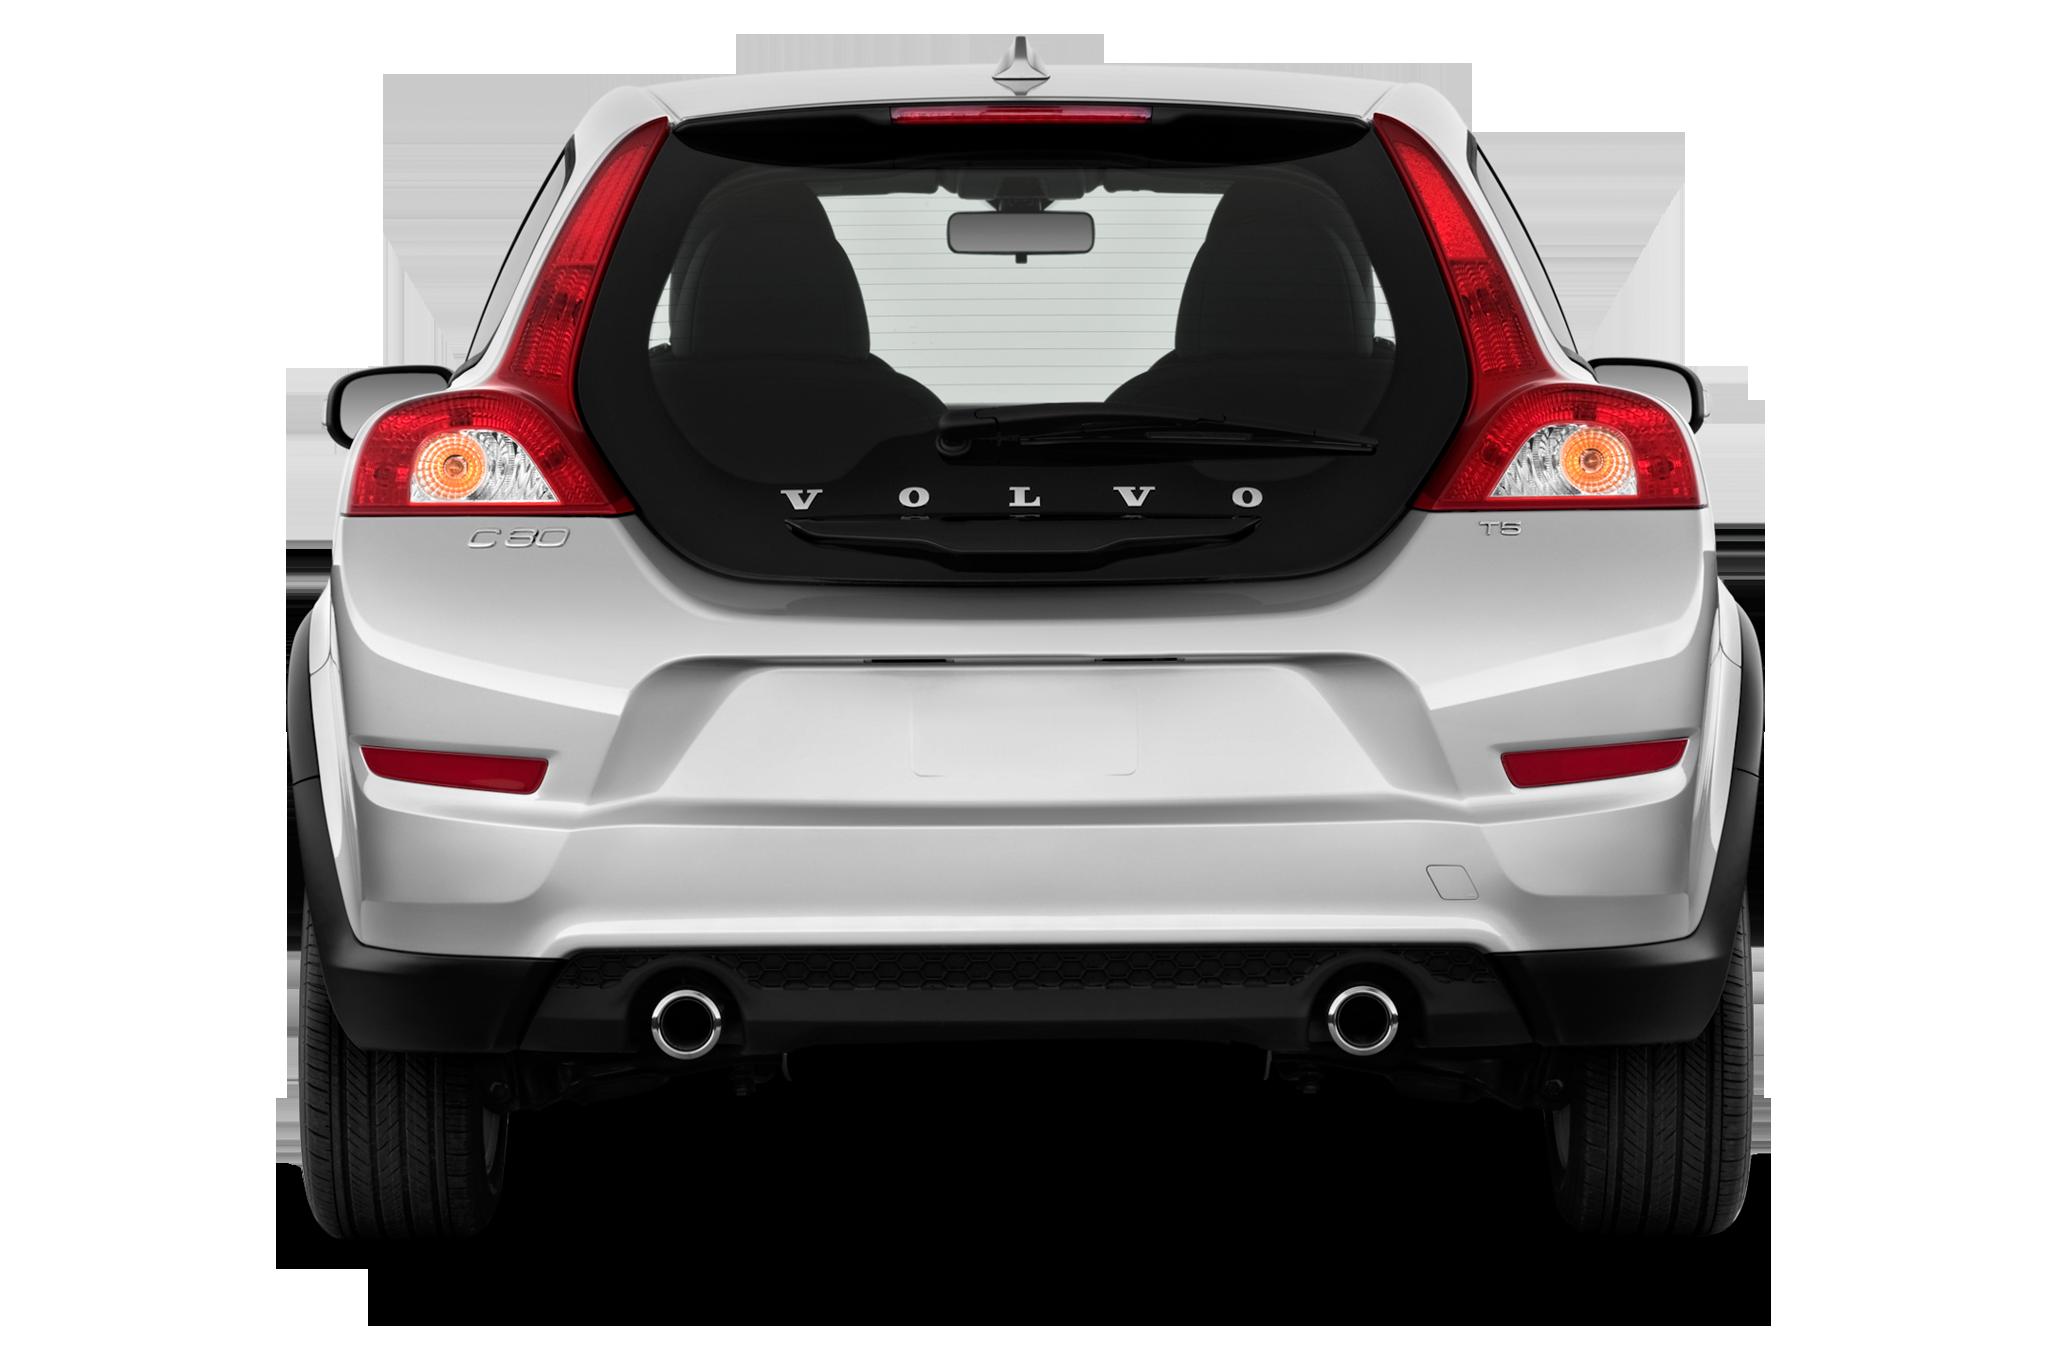 New 250-HP Volvo C30 Polestar Hatch to Cost $32,445